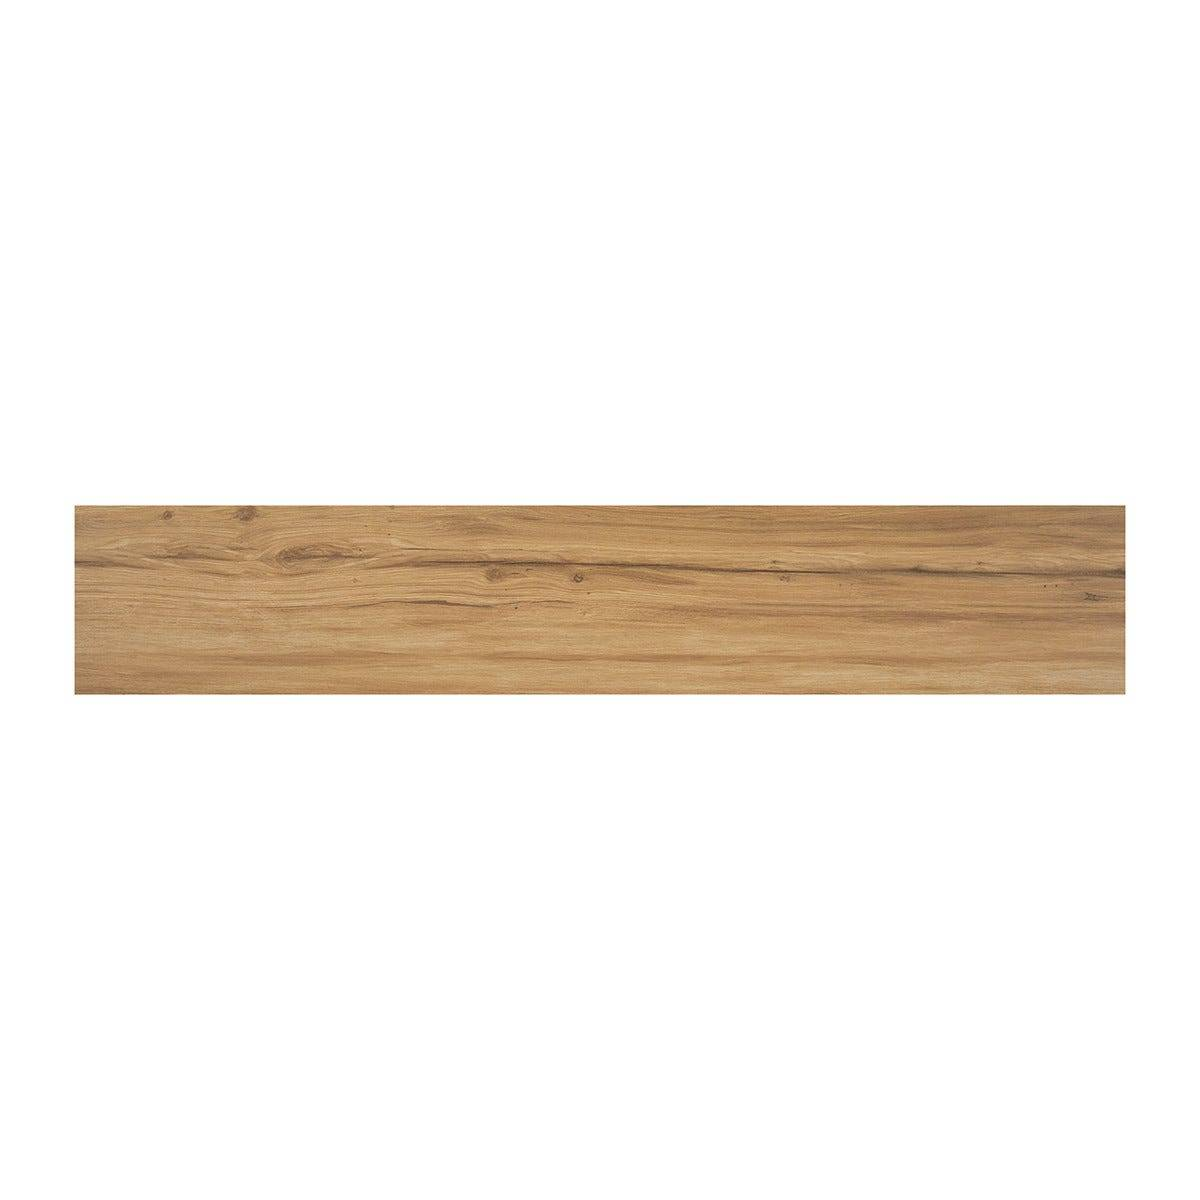 Miele Pavimento Legno Springwood Miele 23x120x1 Cm Pei 4 R10 Gres Porcellanato